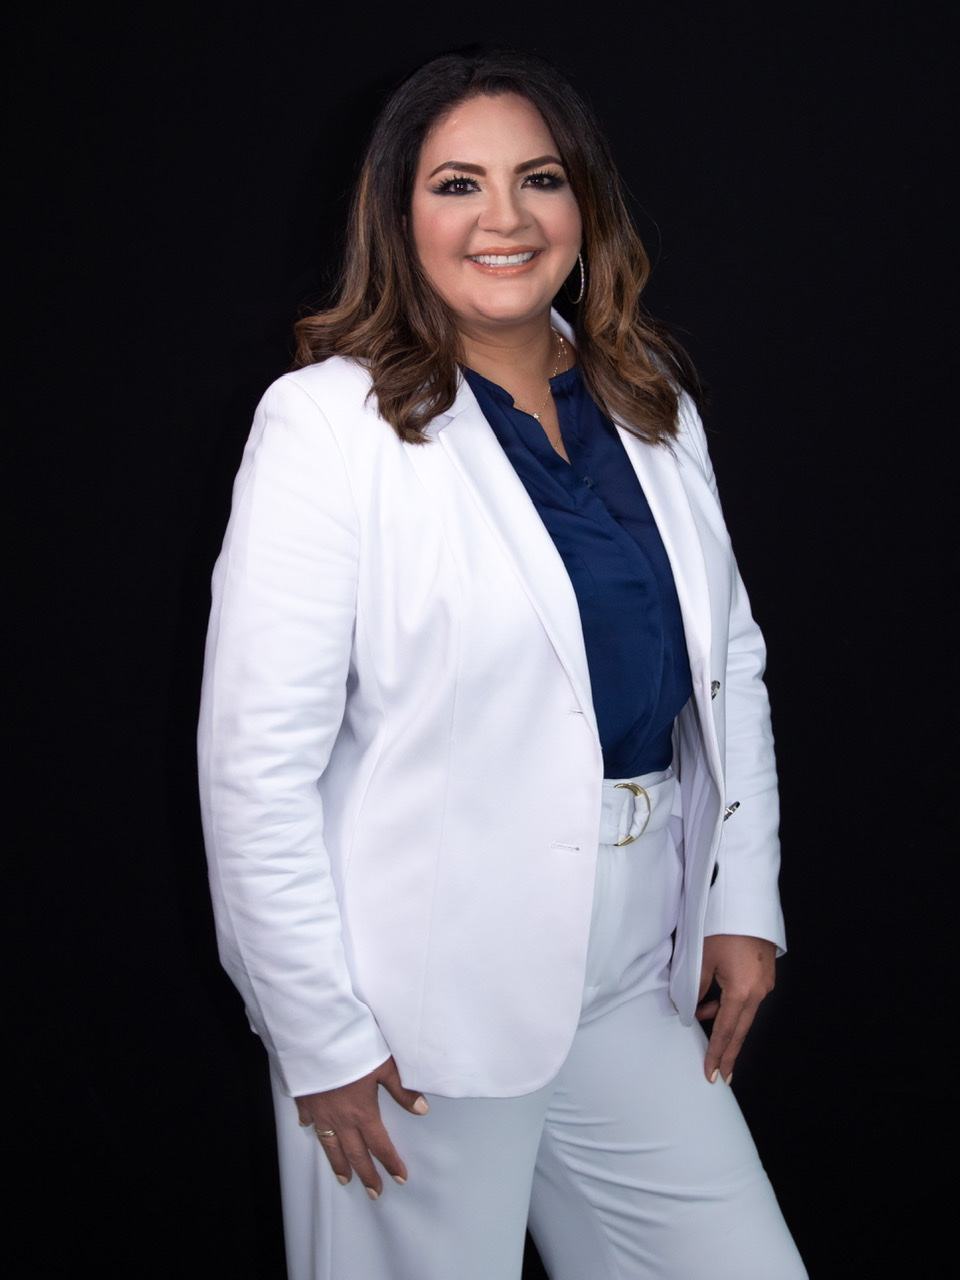 Marisol Giron